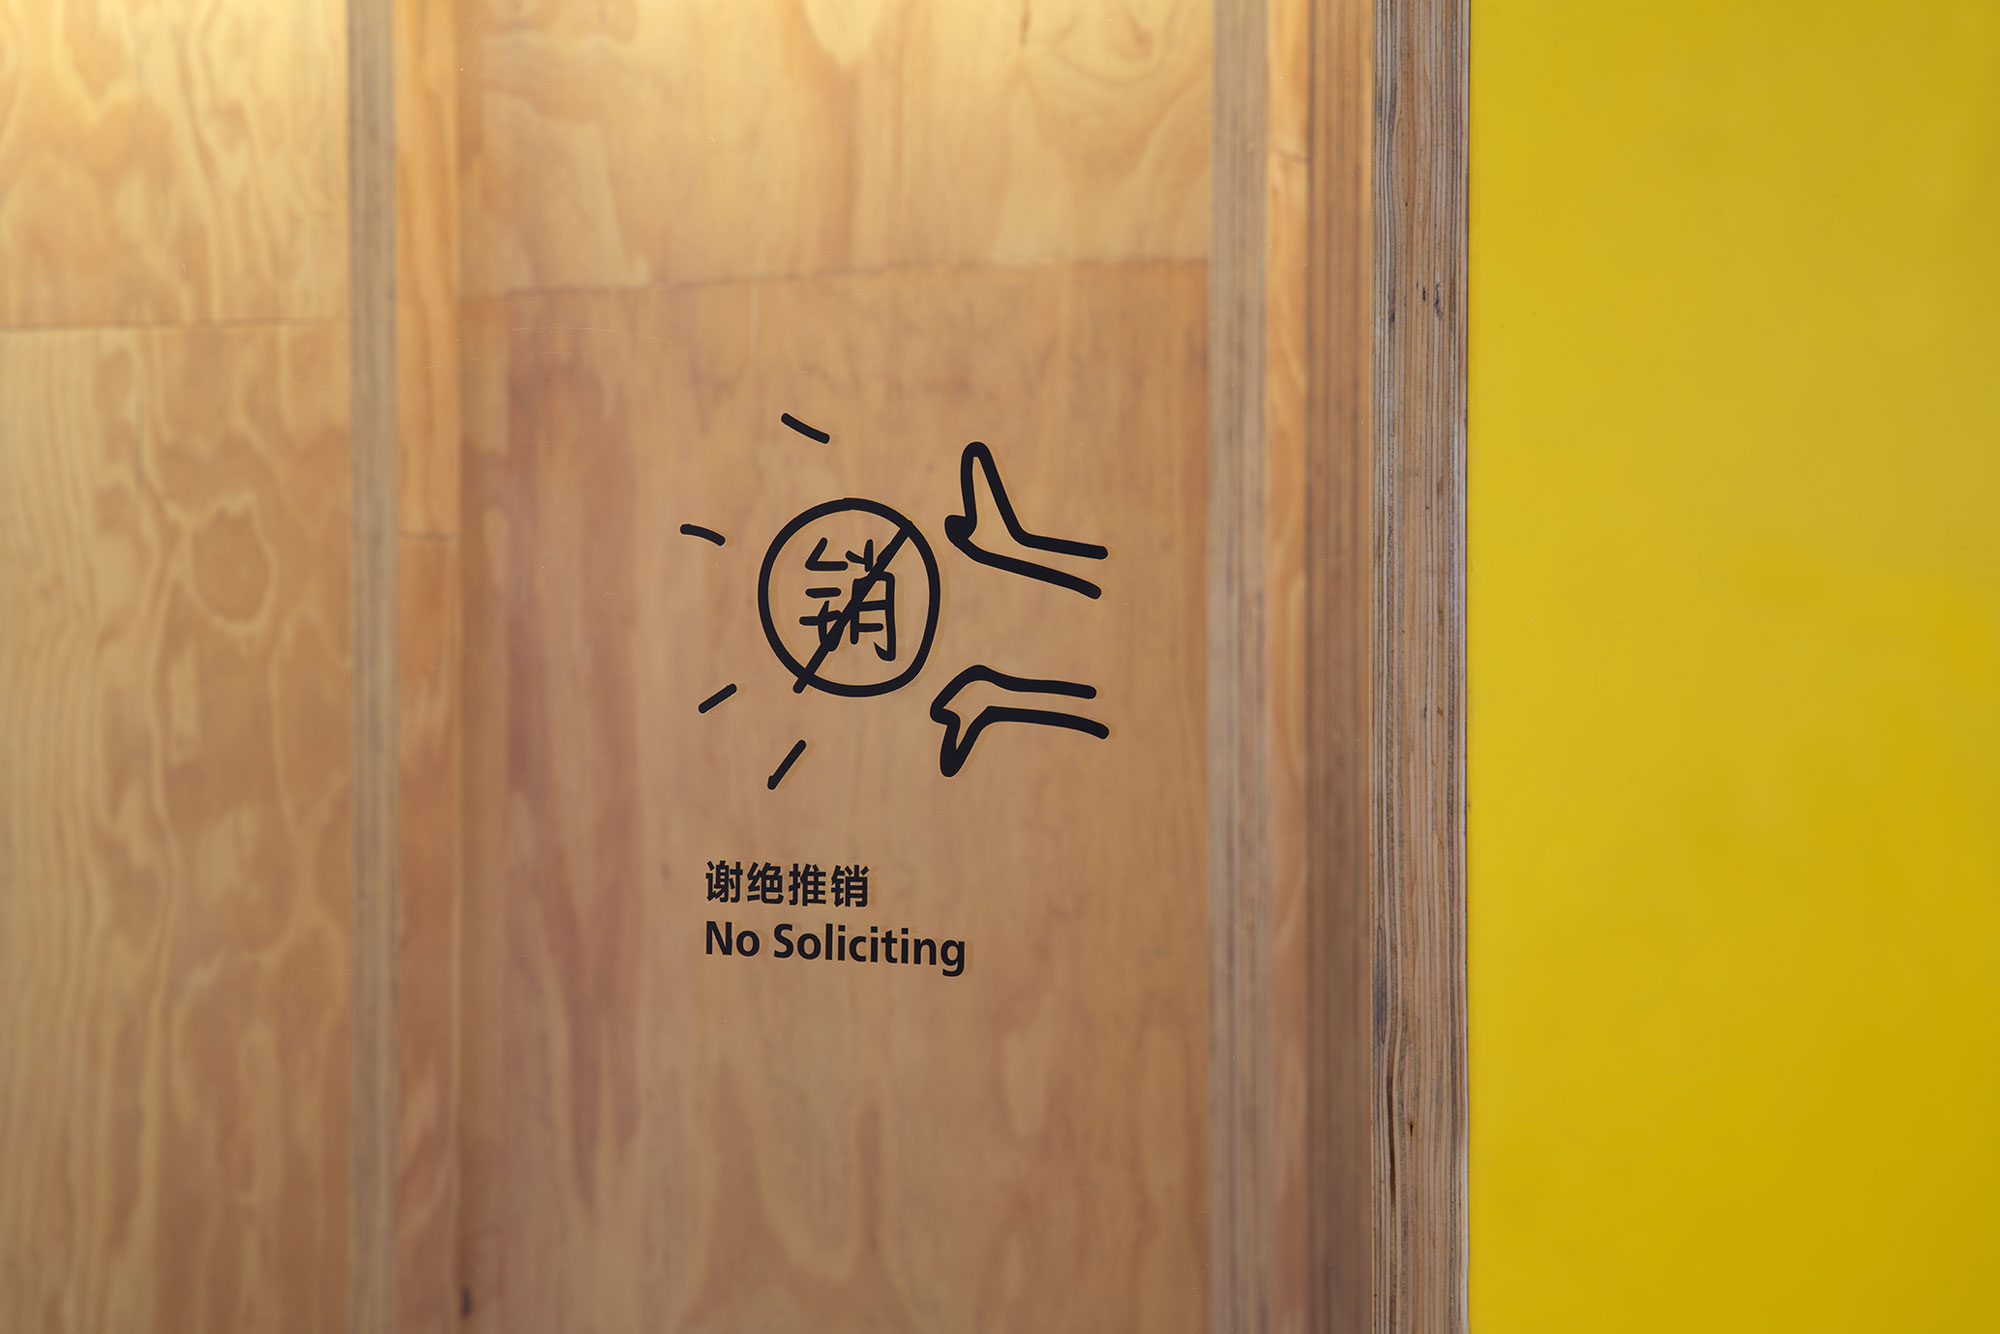 ZUCZUG上海总公司导视设计©702 Design